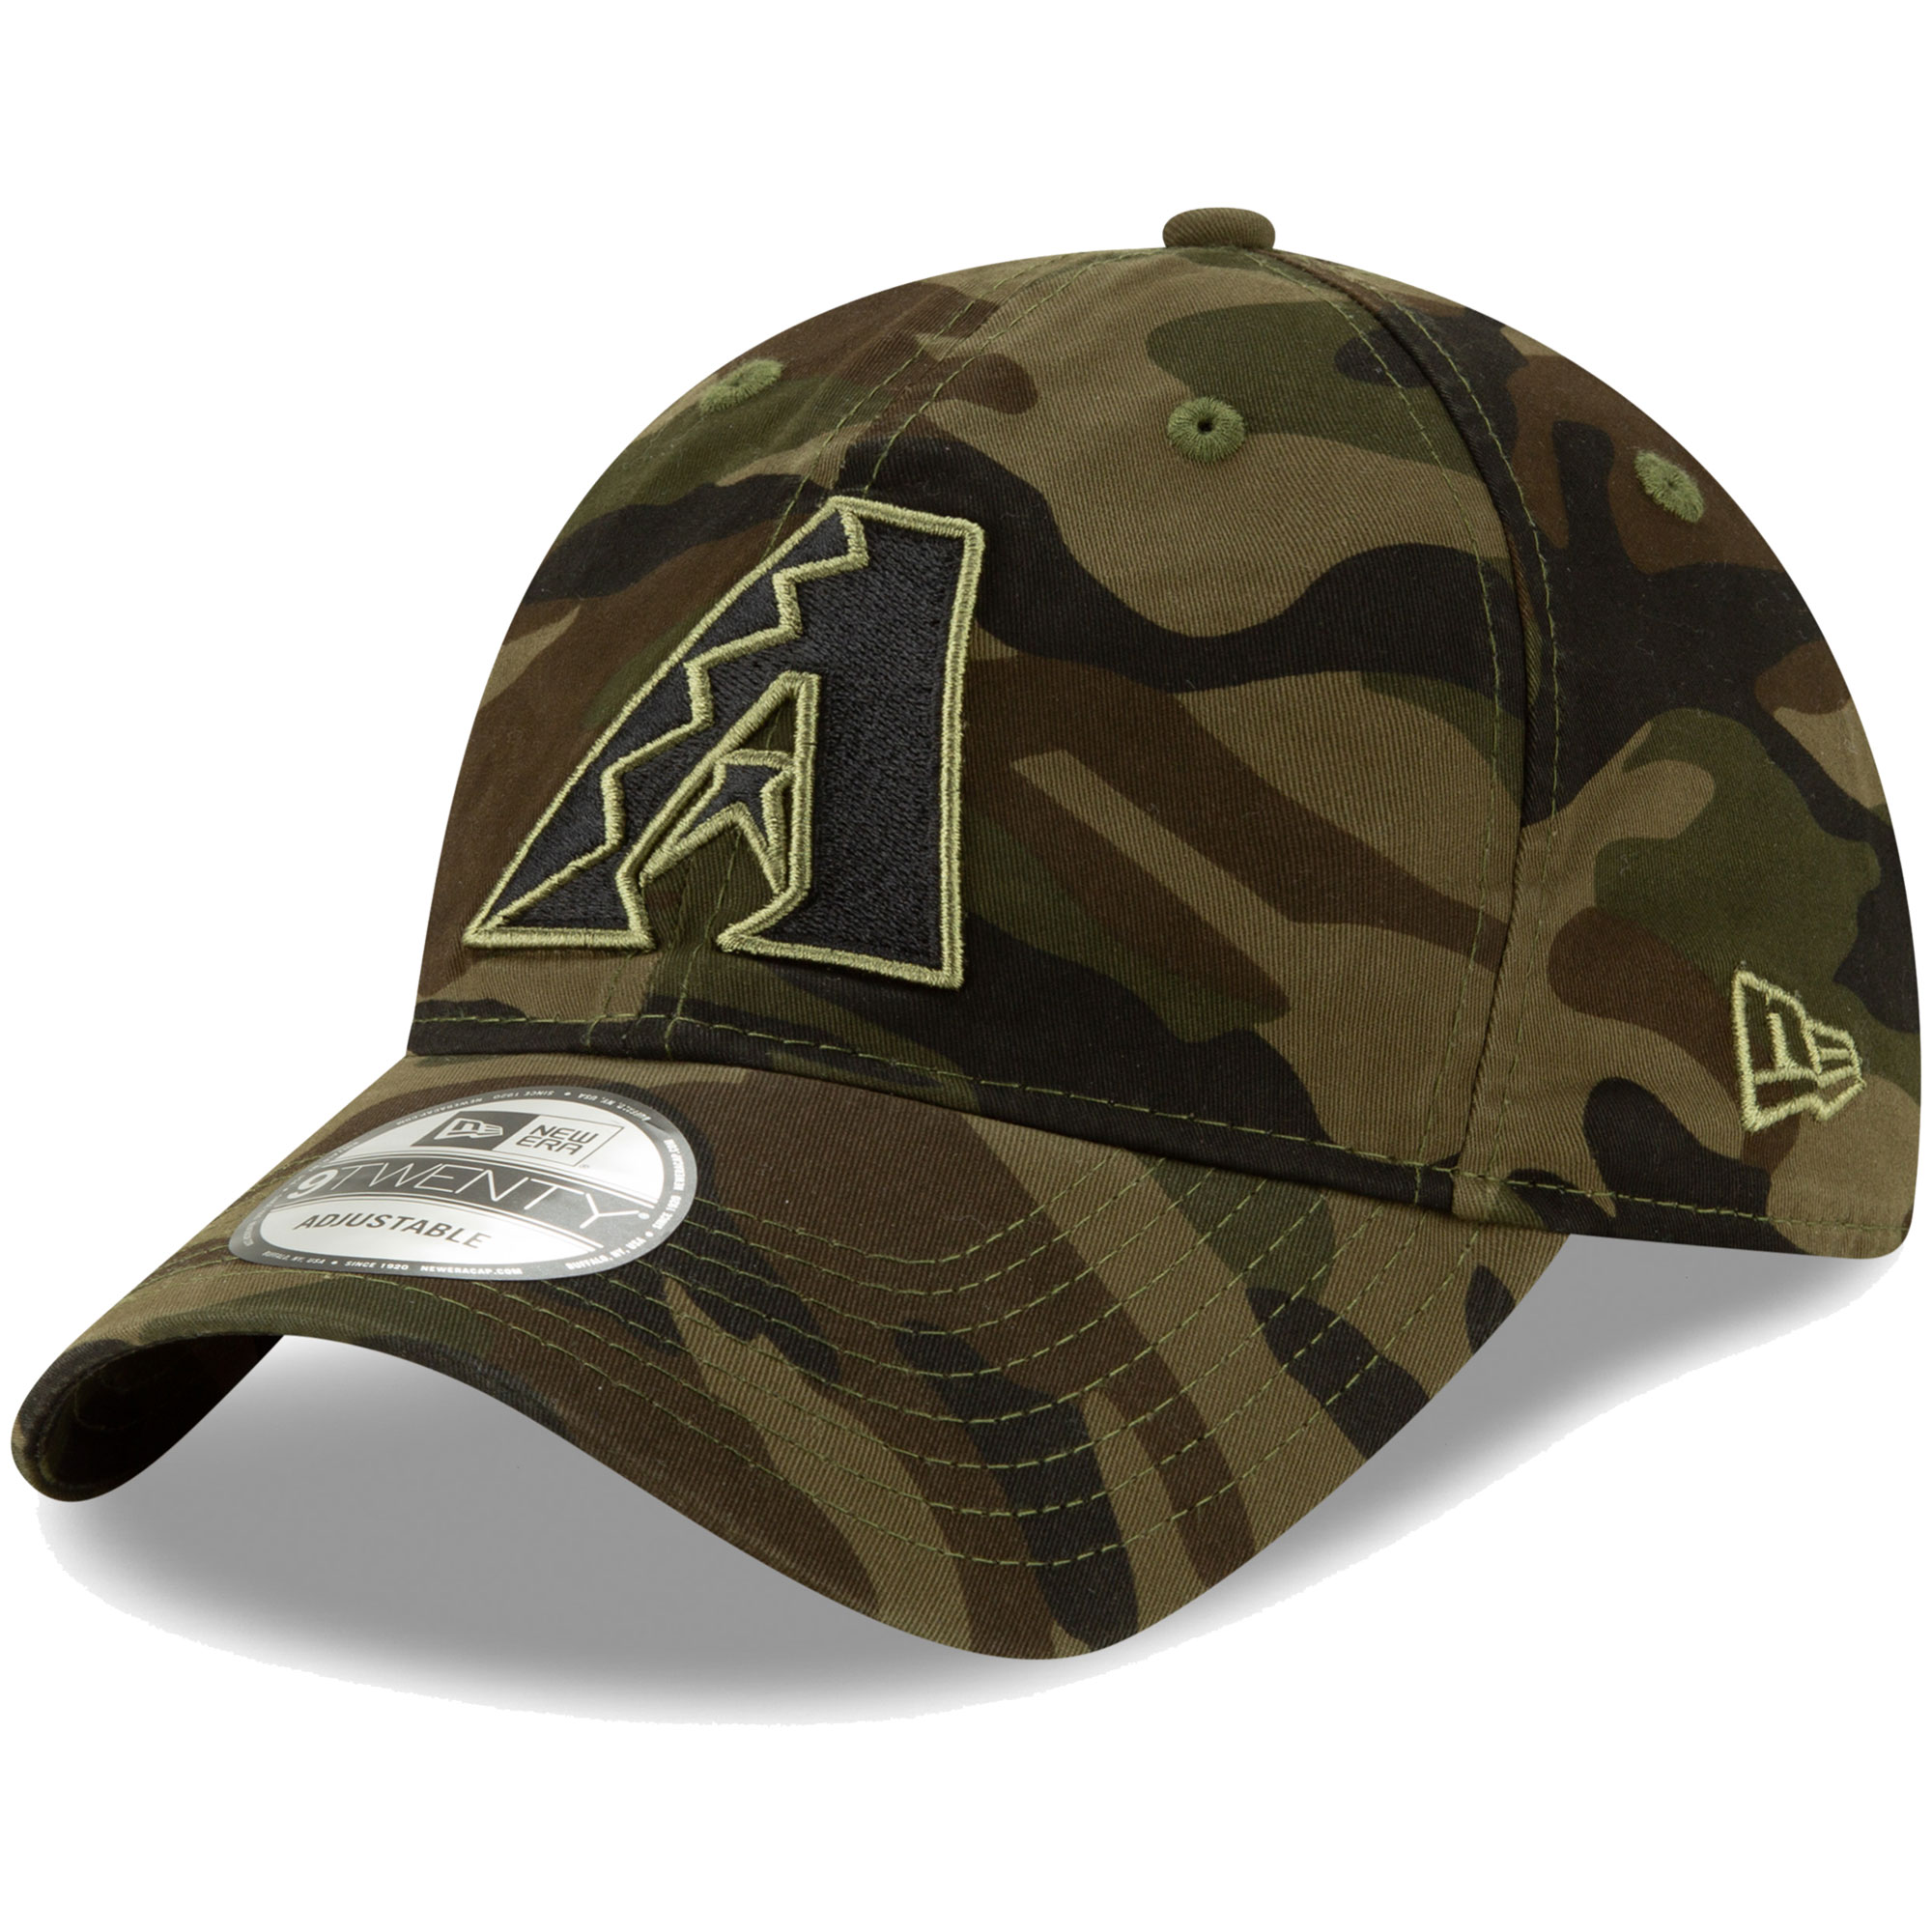 Arizona Diamondbacks New Era Tonal Camo Core Classic 9TWENTY Adjustable Hat - Camo - OSFA